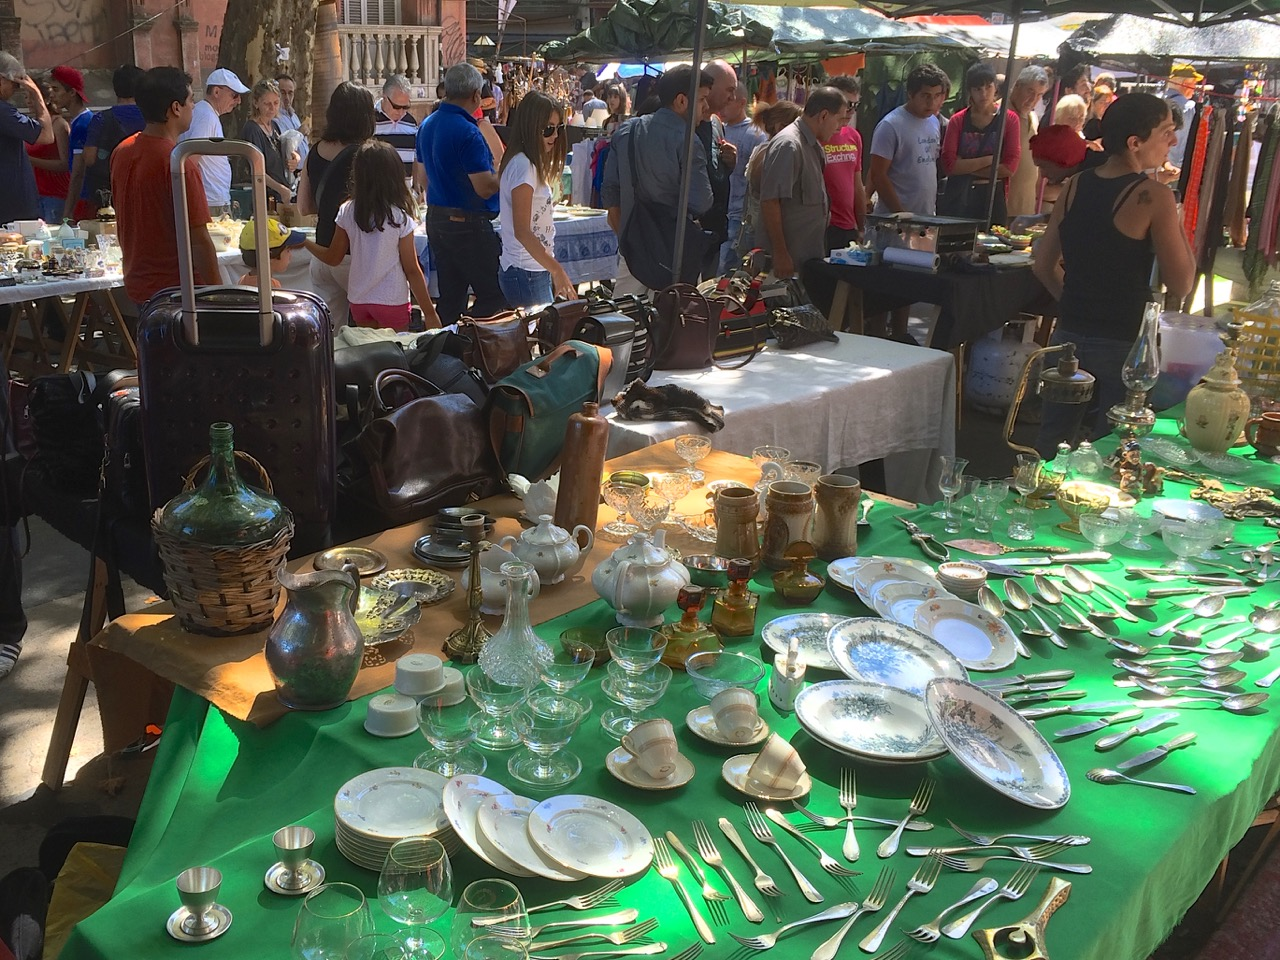 Montevideo Street Market: La Feria de Tristán Narvaja